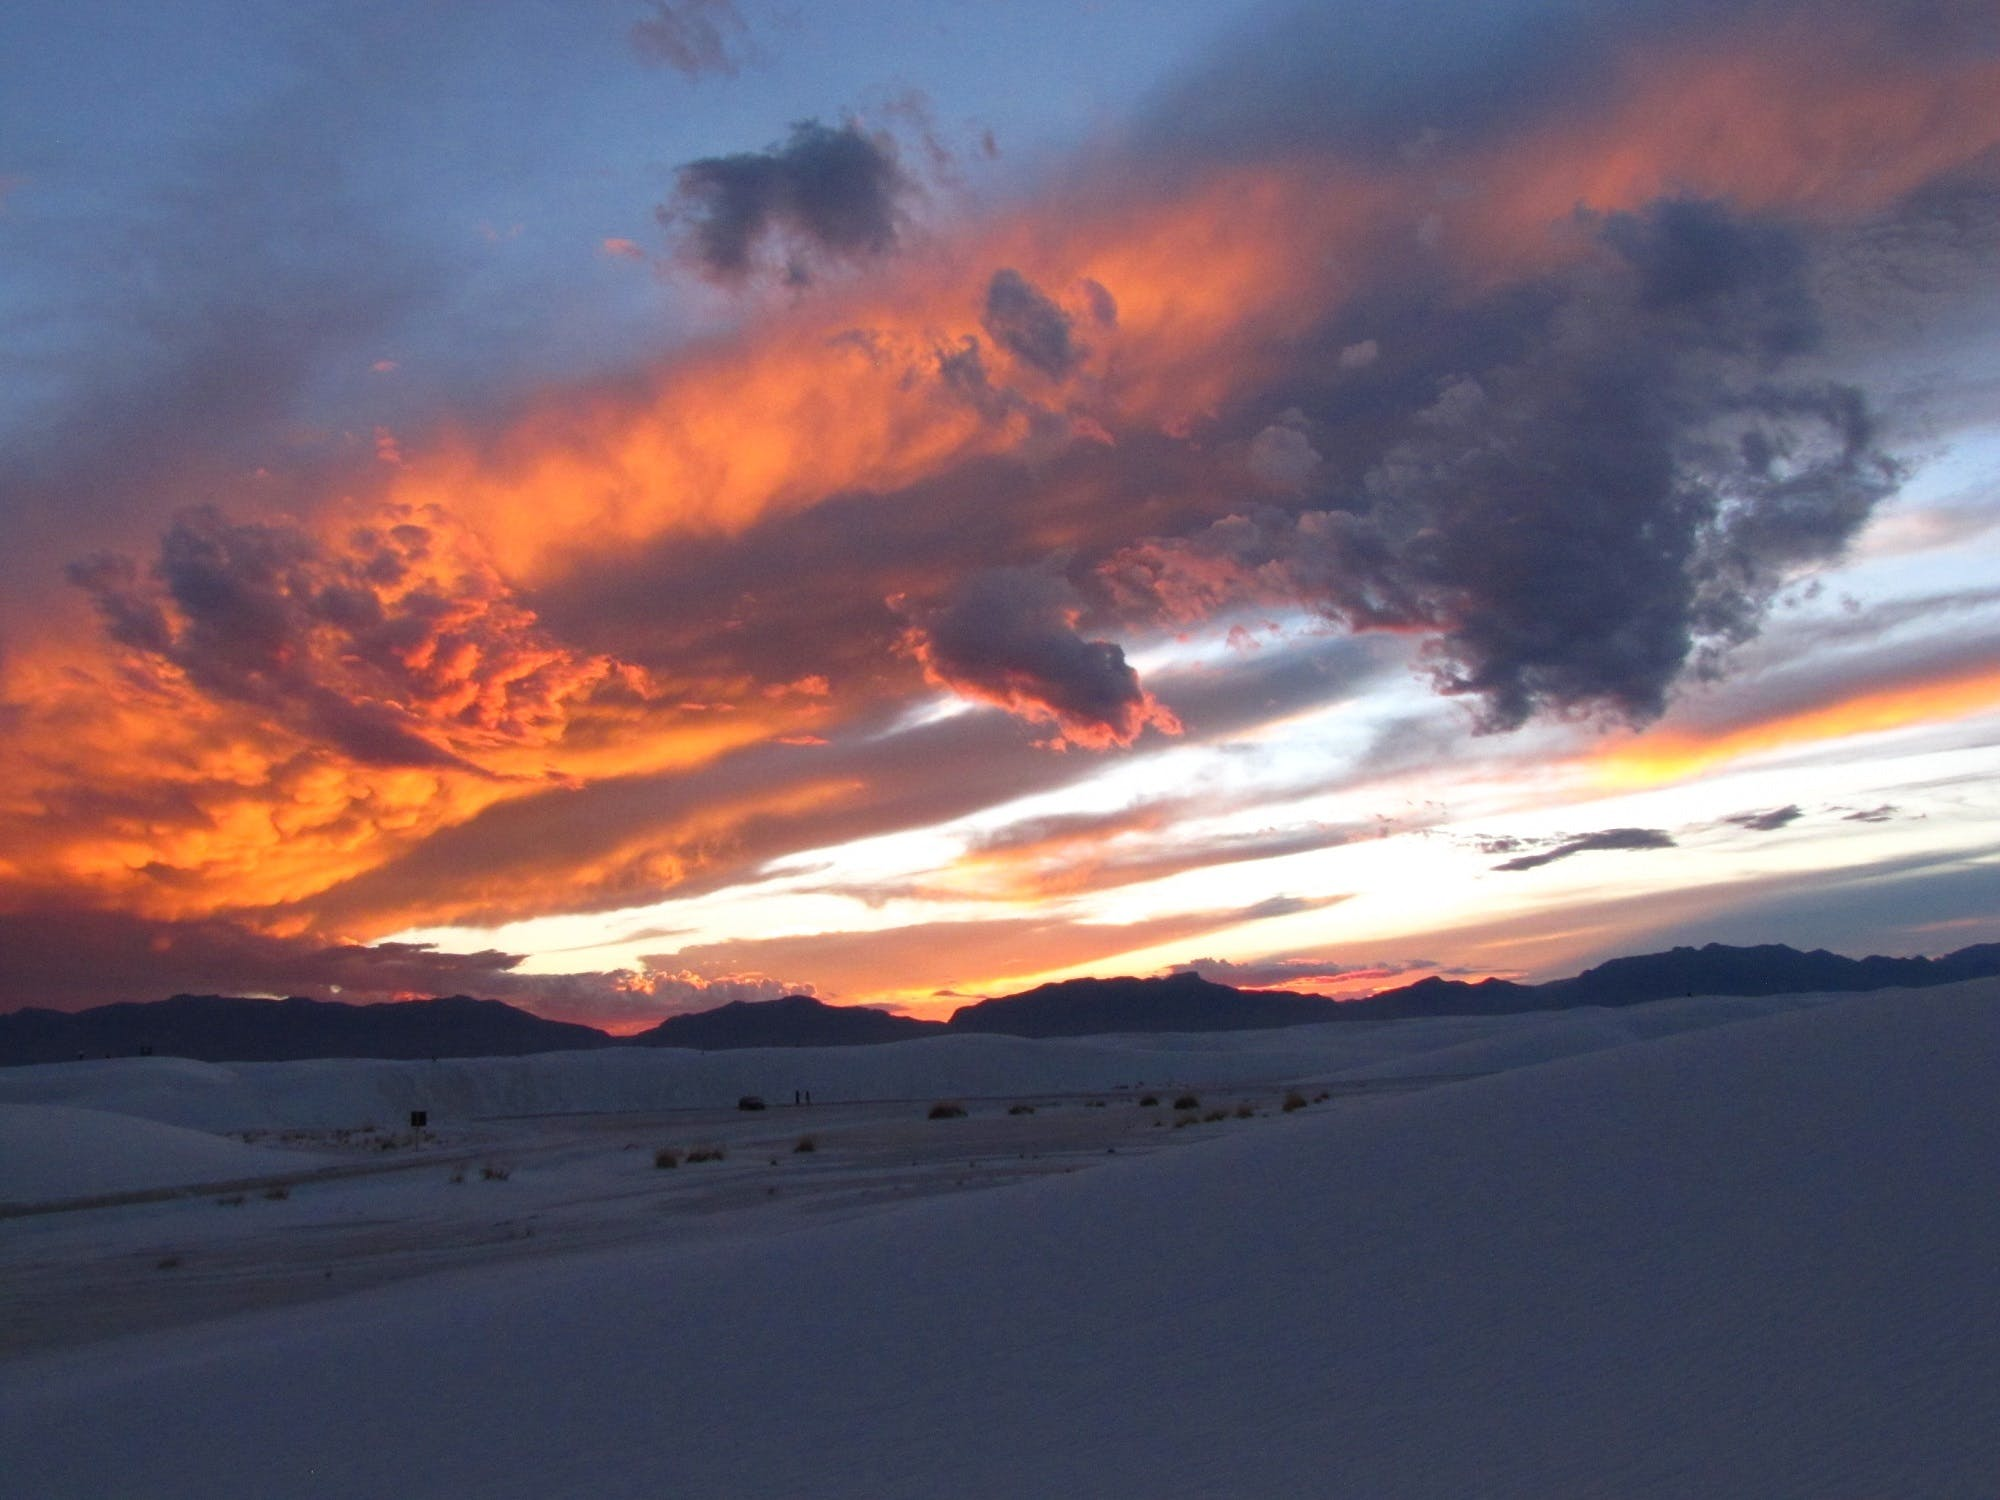 Fotos de stock gratuitas de amanecer, amarillo, arena, azul